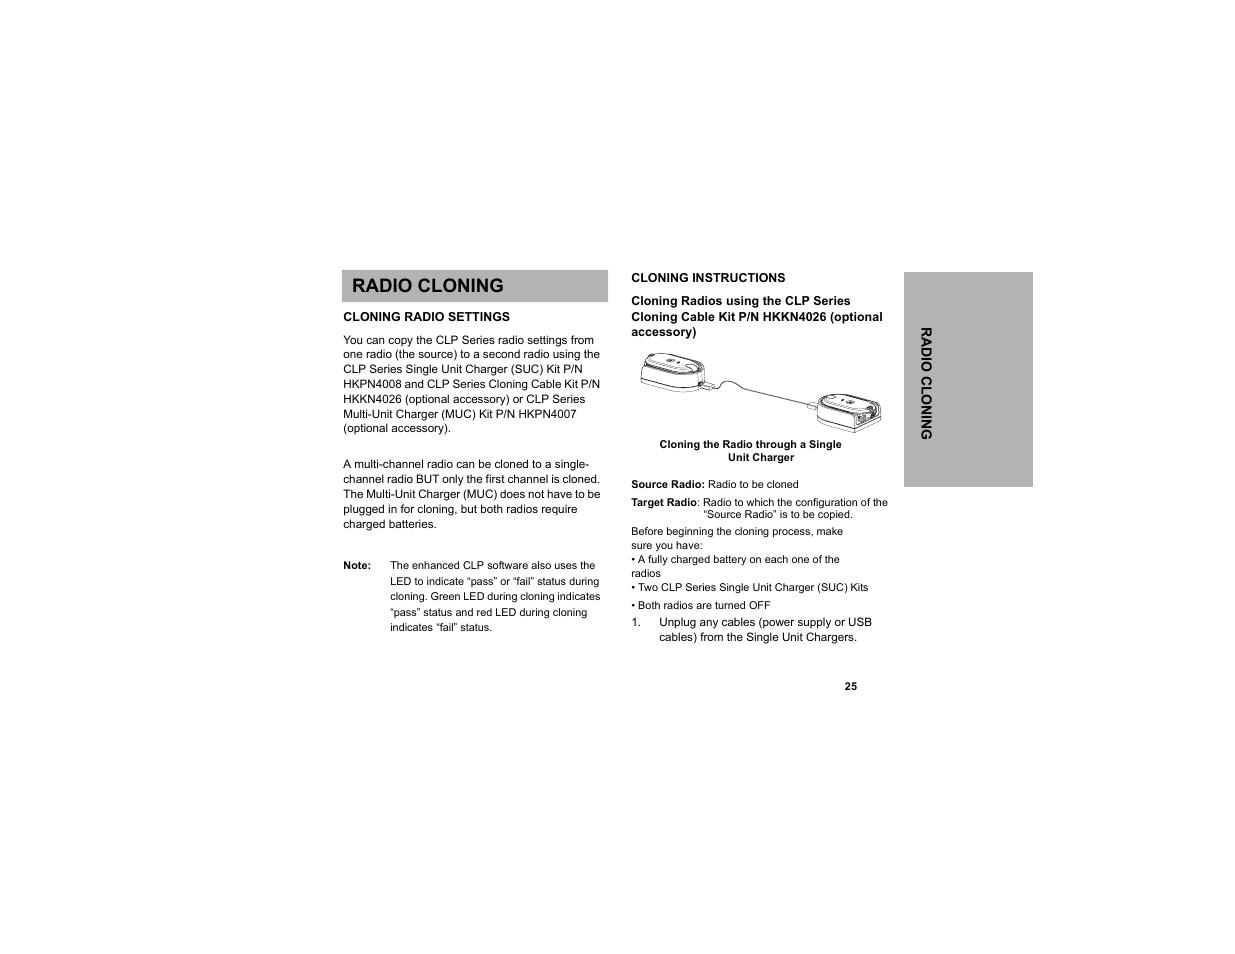 Radio Cloning Motorola Clp1040 User Manual Page 33 56 Nikon D40 Usb Cable Schematic